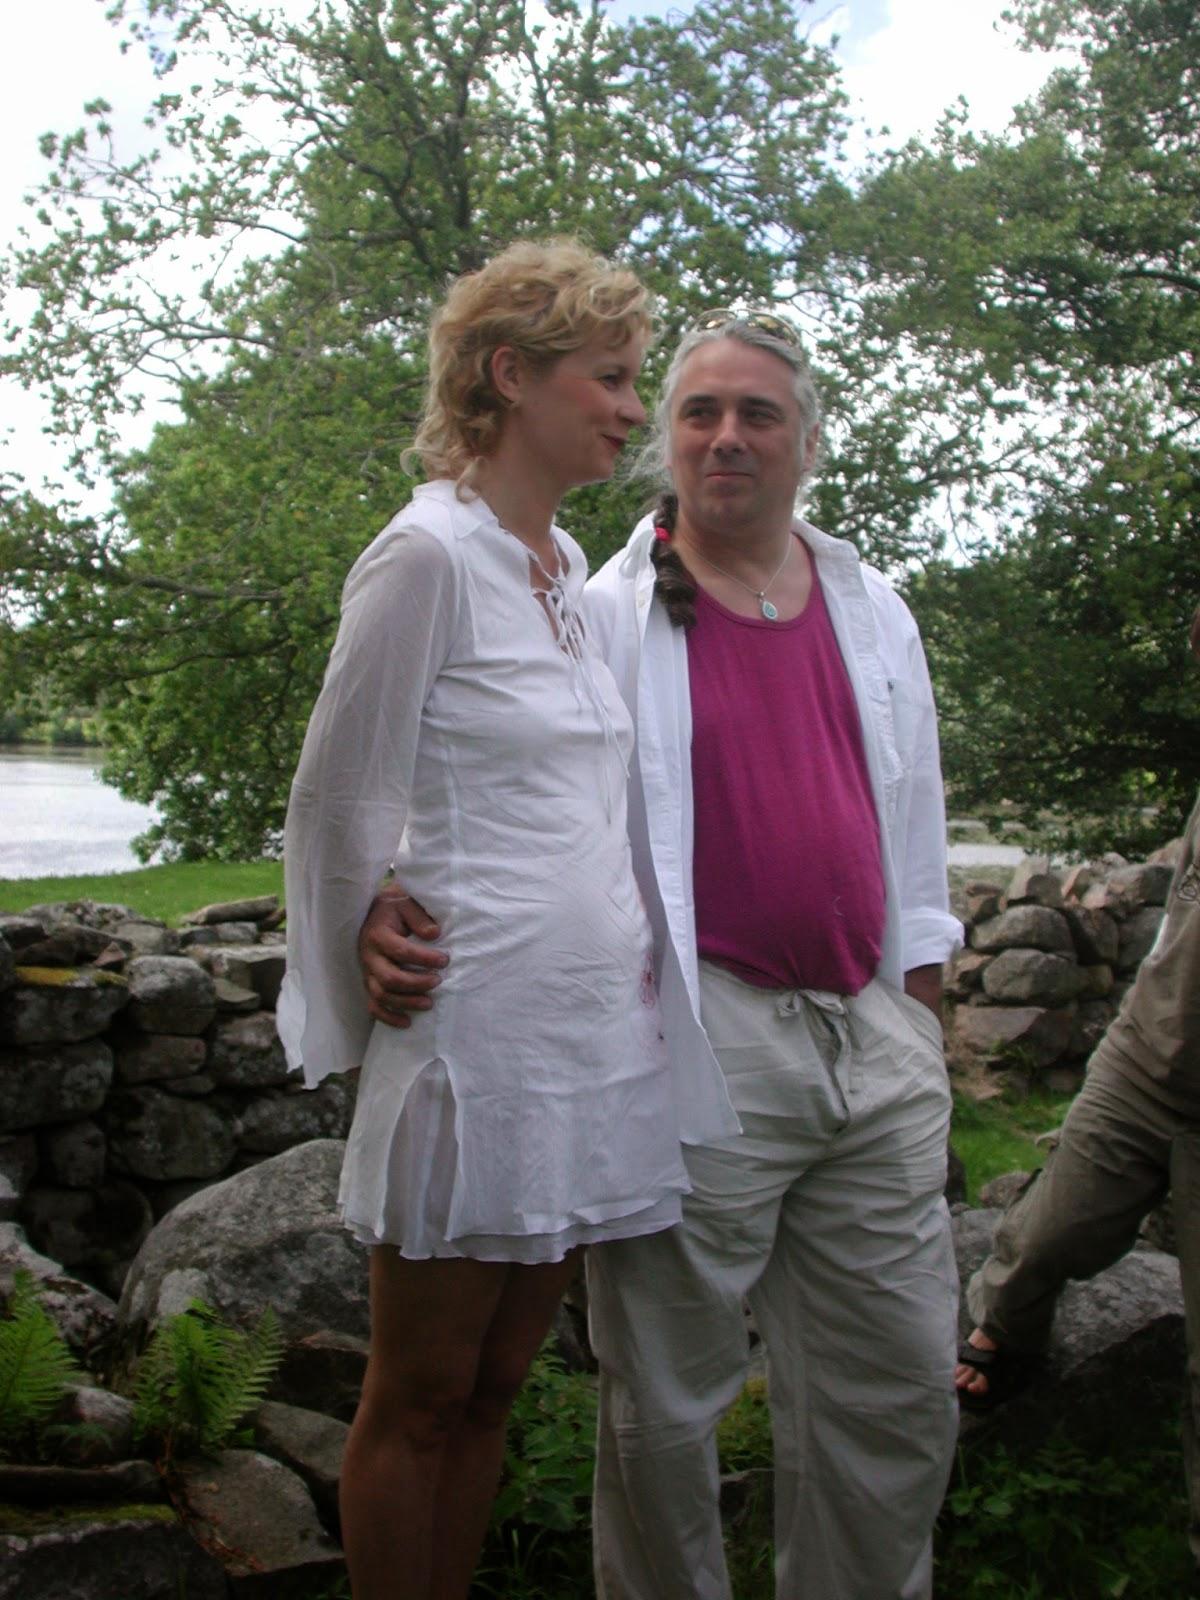 homo escort landskrona cornelis vreeswijk transvestit